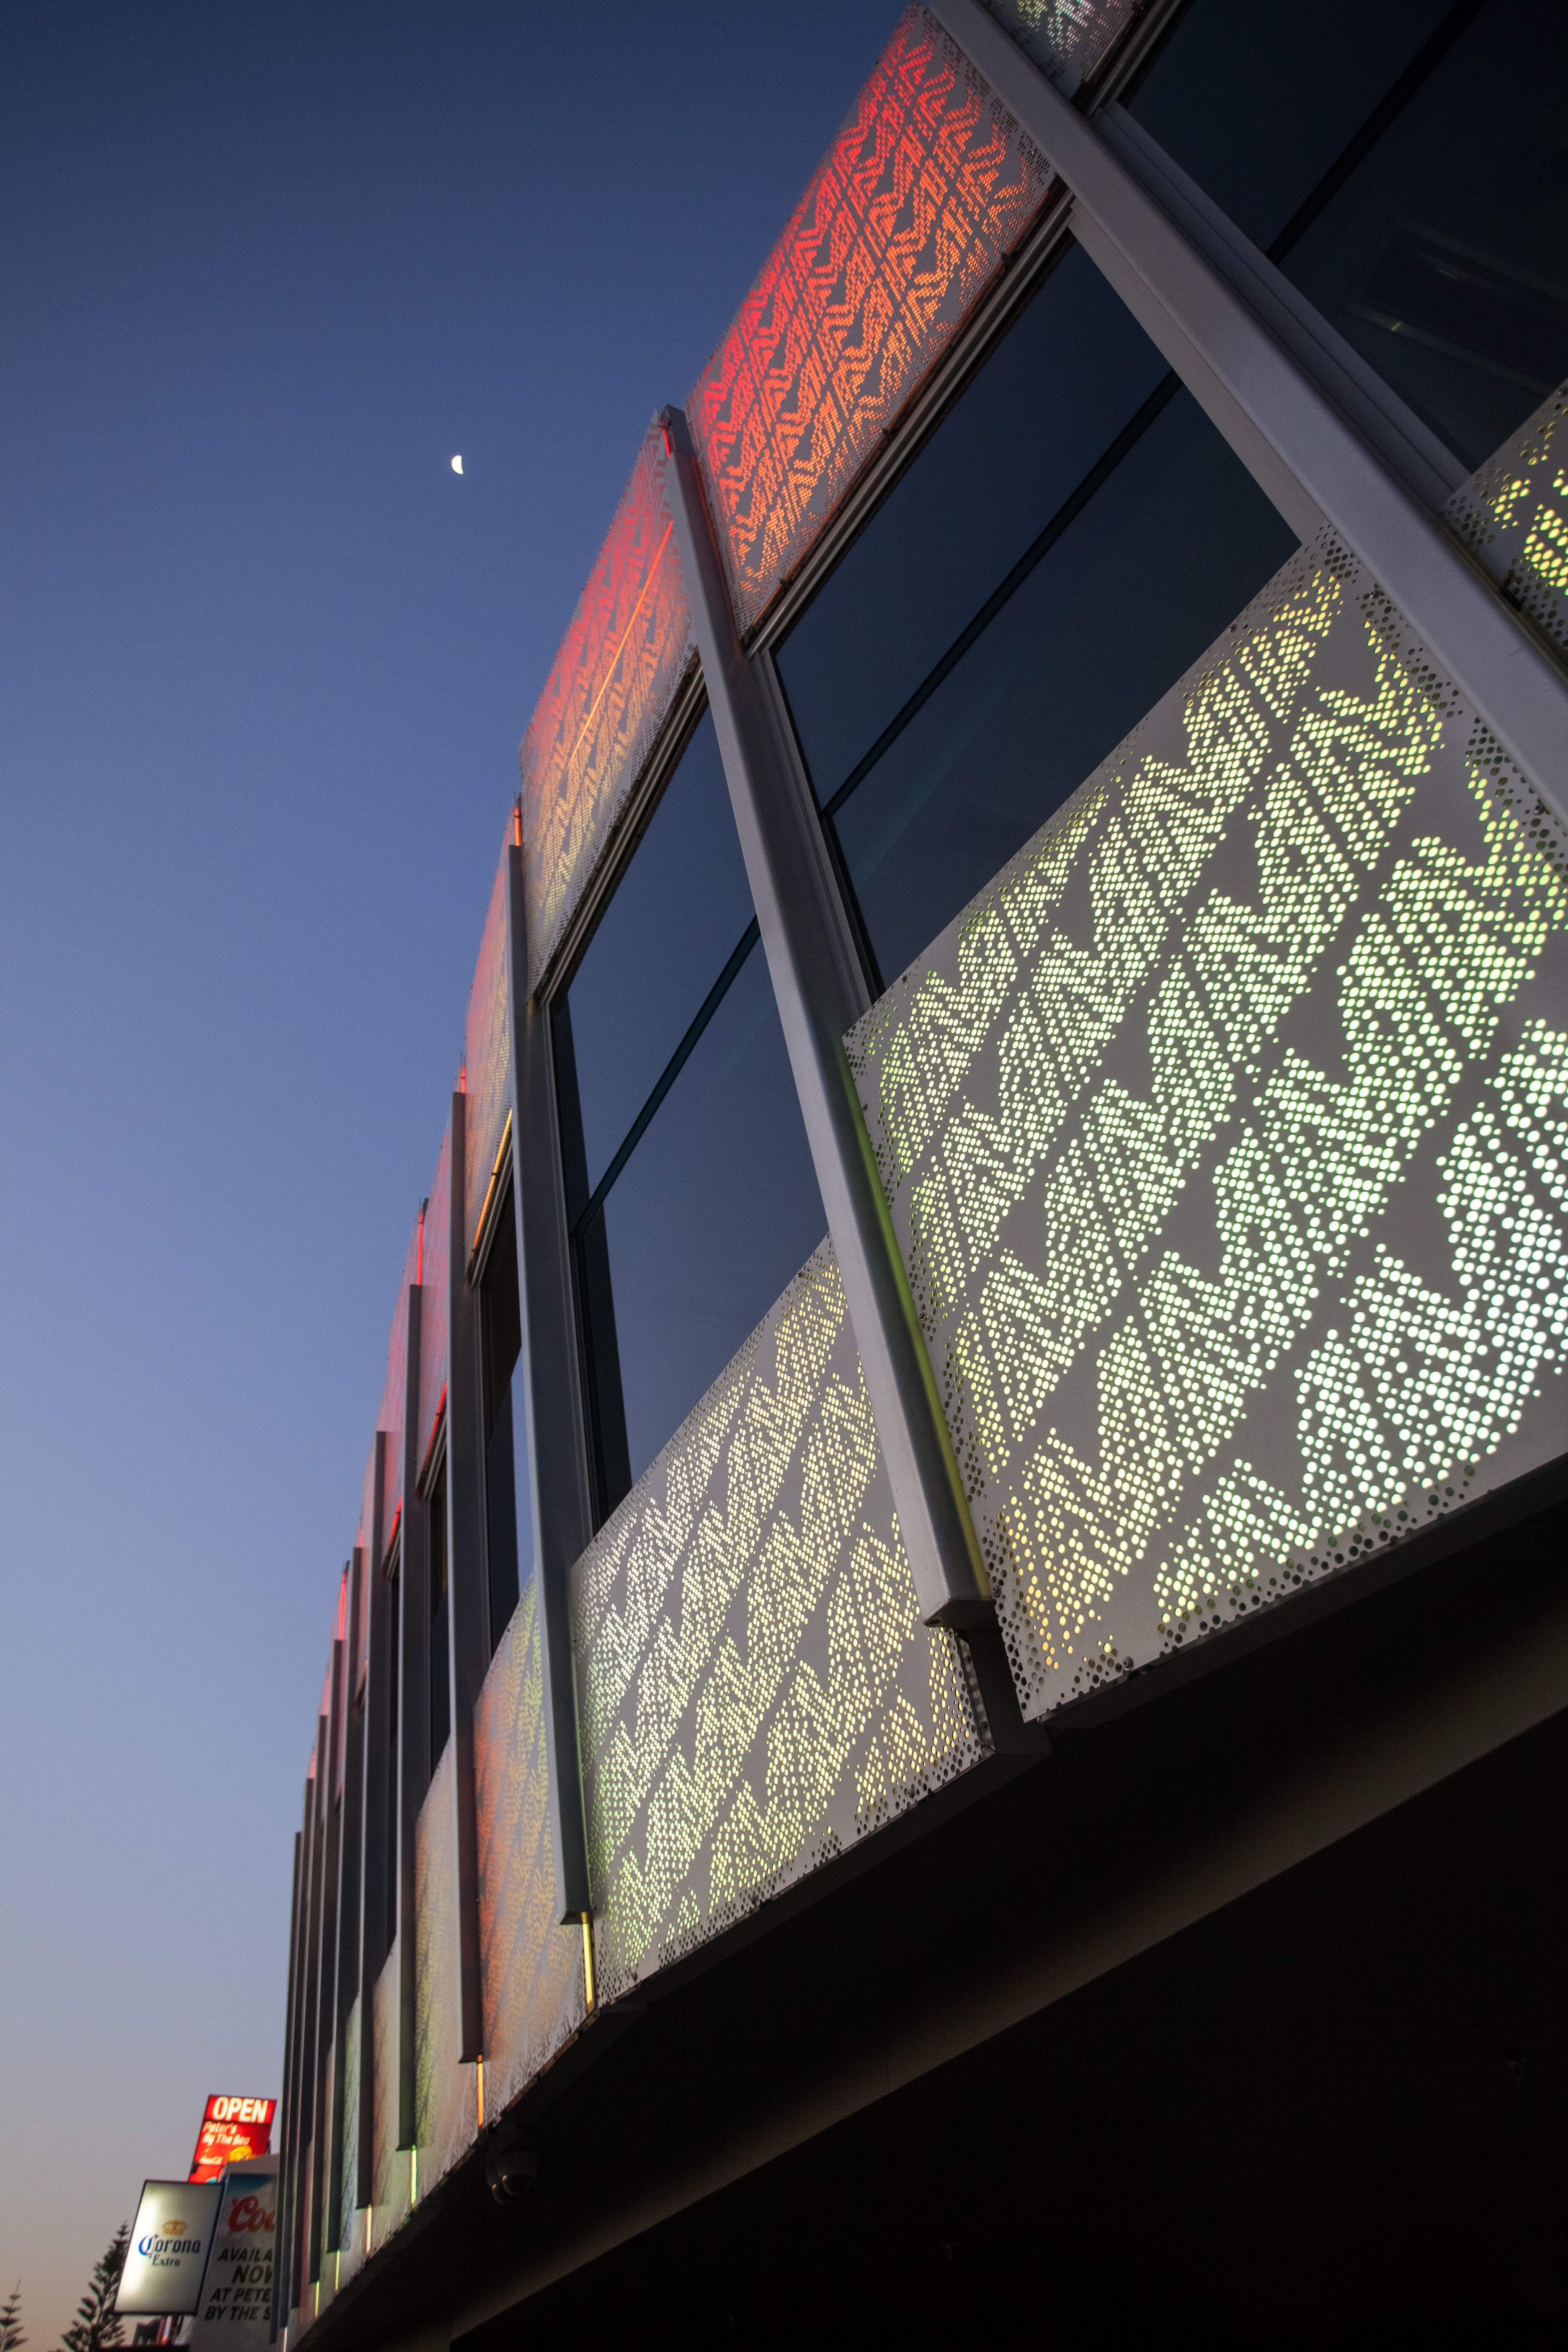 Lighting design at Matisse Beach Club. #LightingOptionsAustralia, #LEDlight, #ClubLighting, #MatisseBeachClub http://www.LightingOptionsAustralia.com.au/